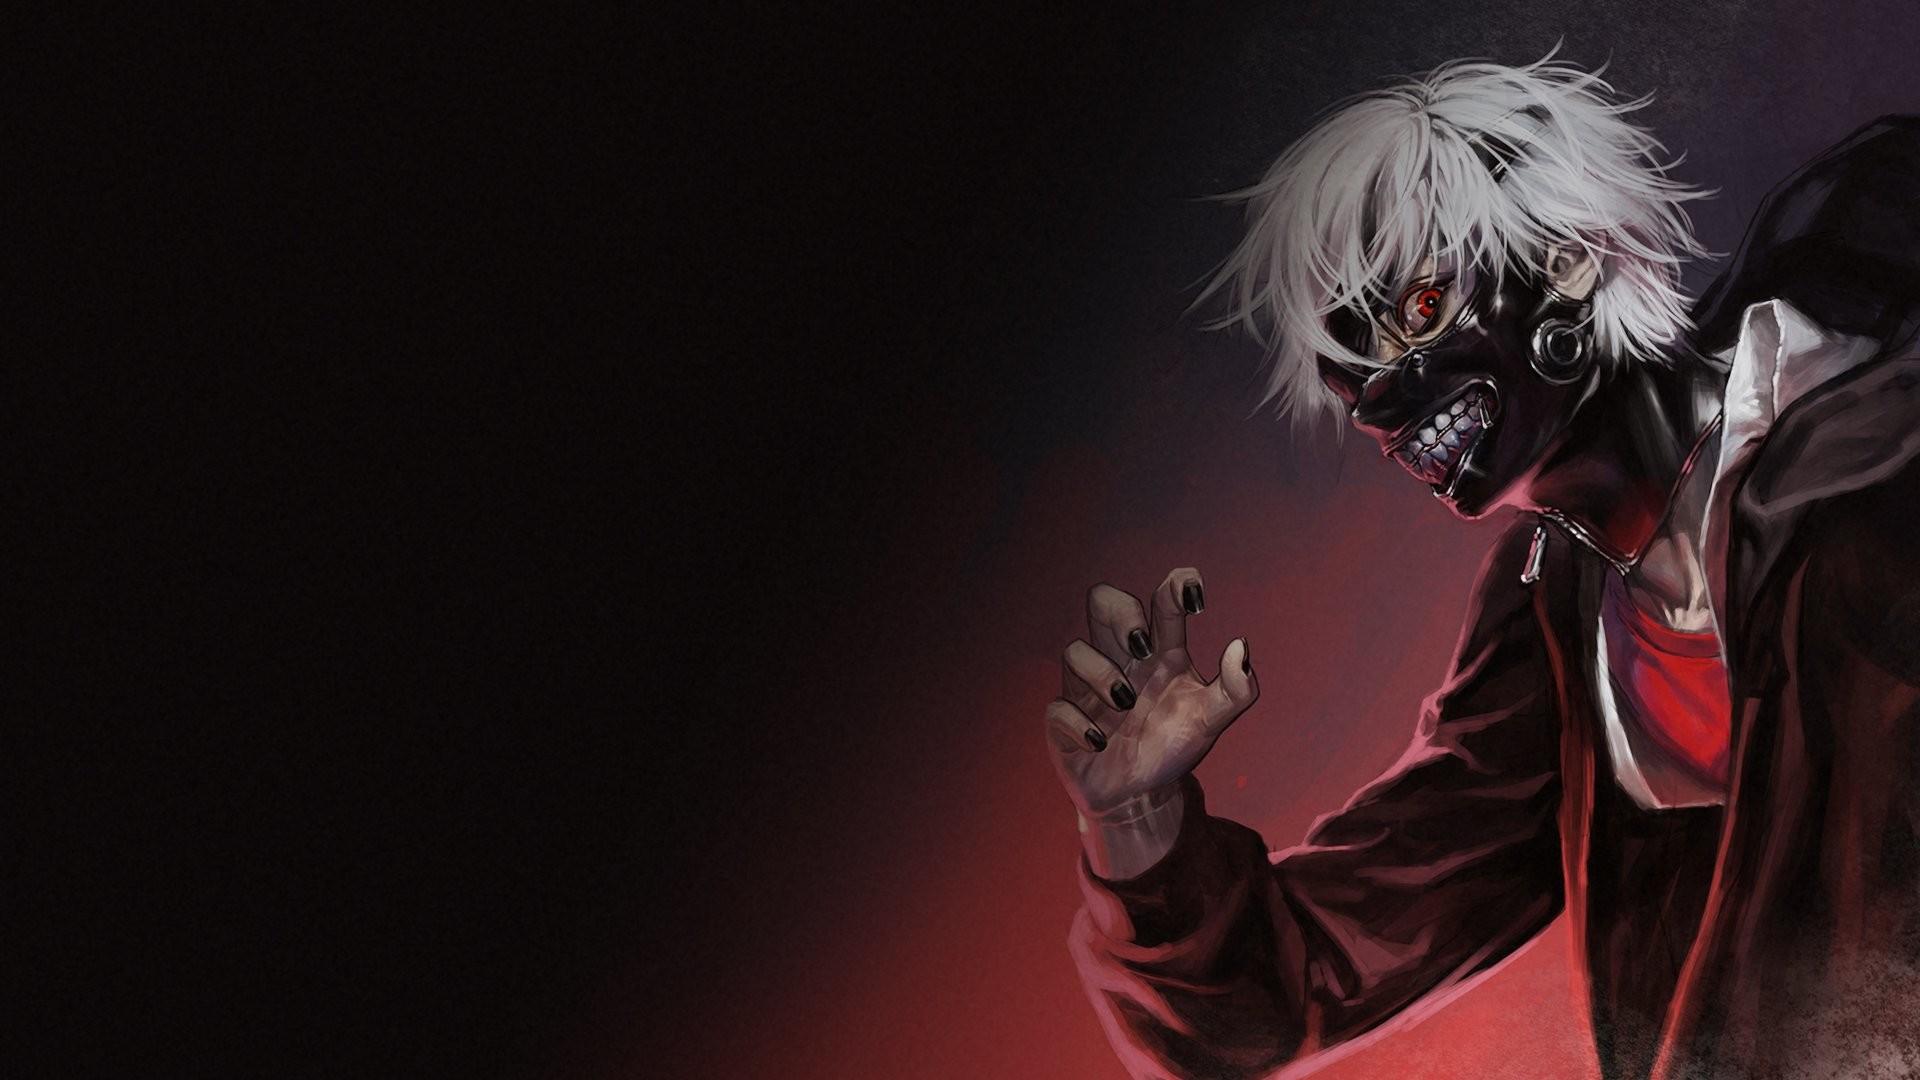 HD Duvar kağıdı | Arka plan ID:545916. Anime Tokyo Ghoul